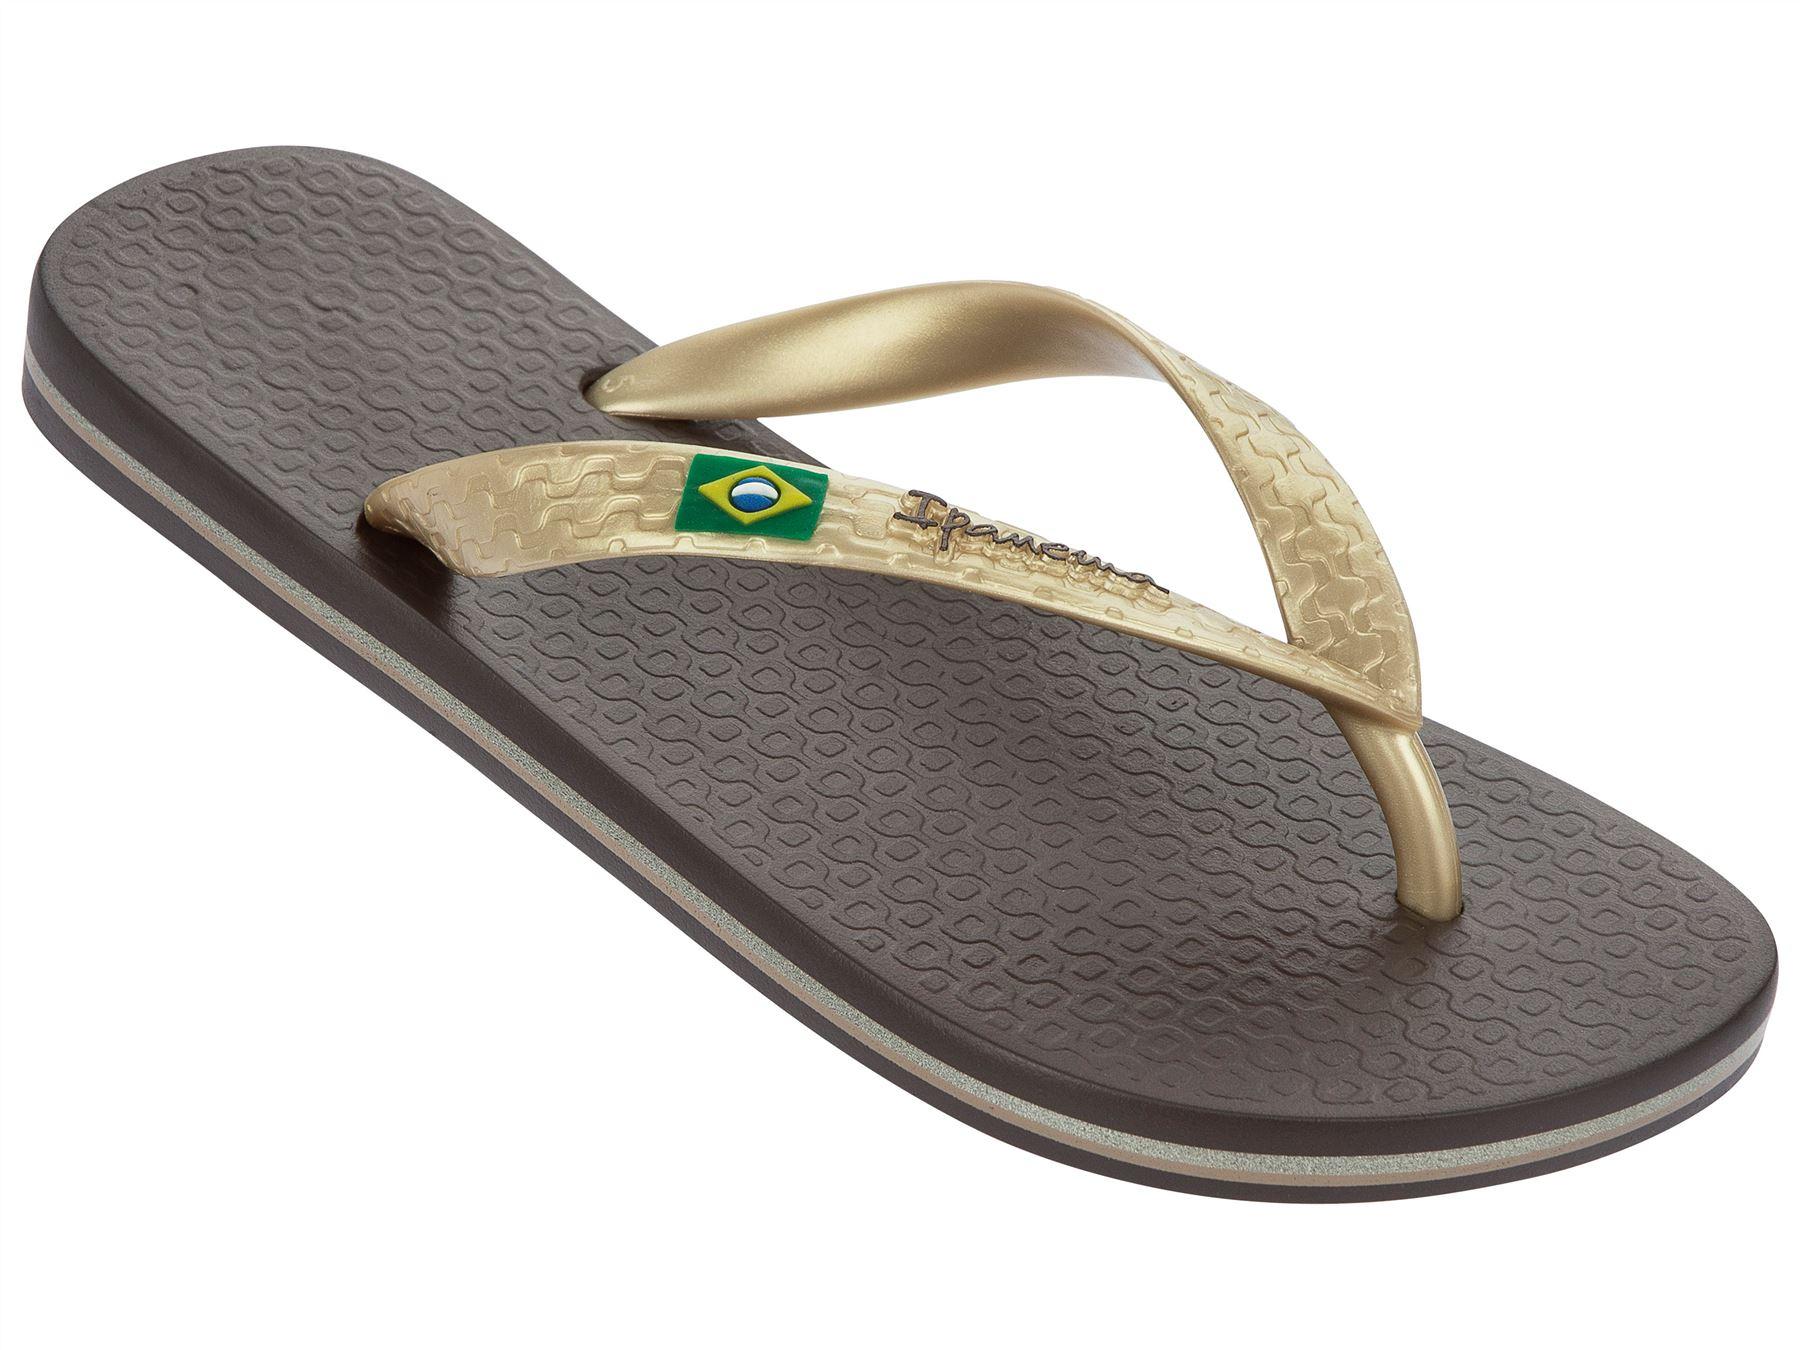 3521e8f19fab The sparkly rhinestone embellished flag detail on each strap proudly  celebrates Ipanema s Brazilian ...